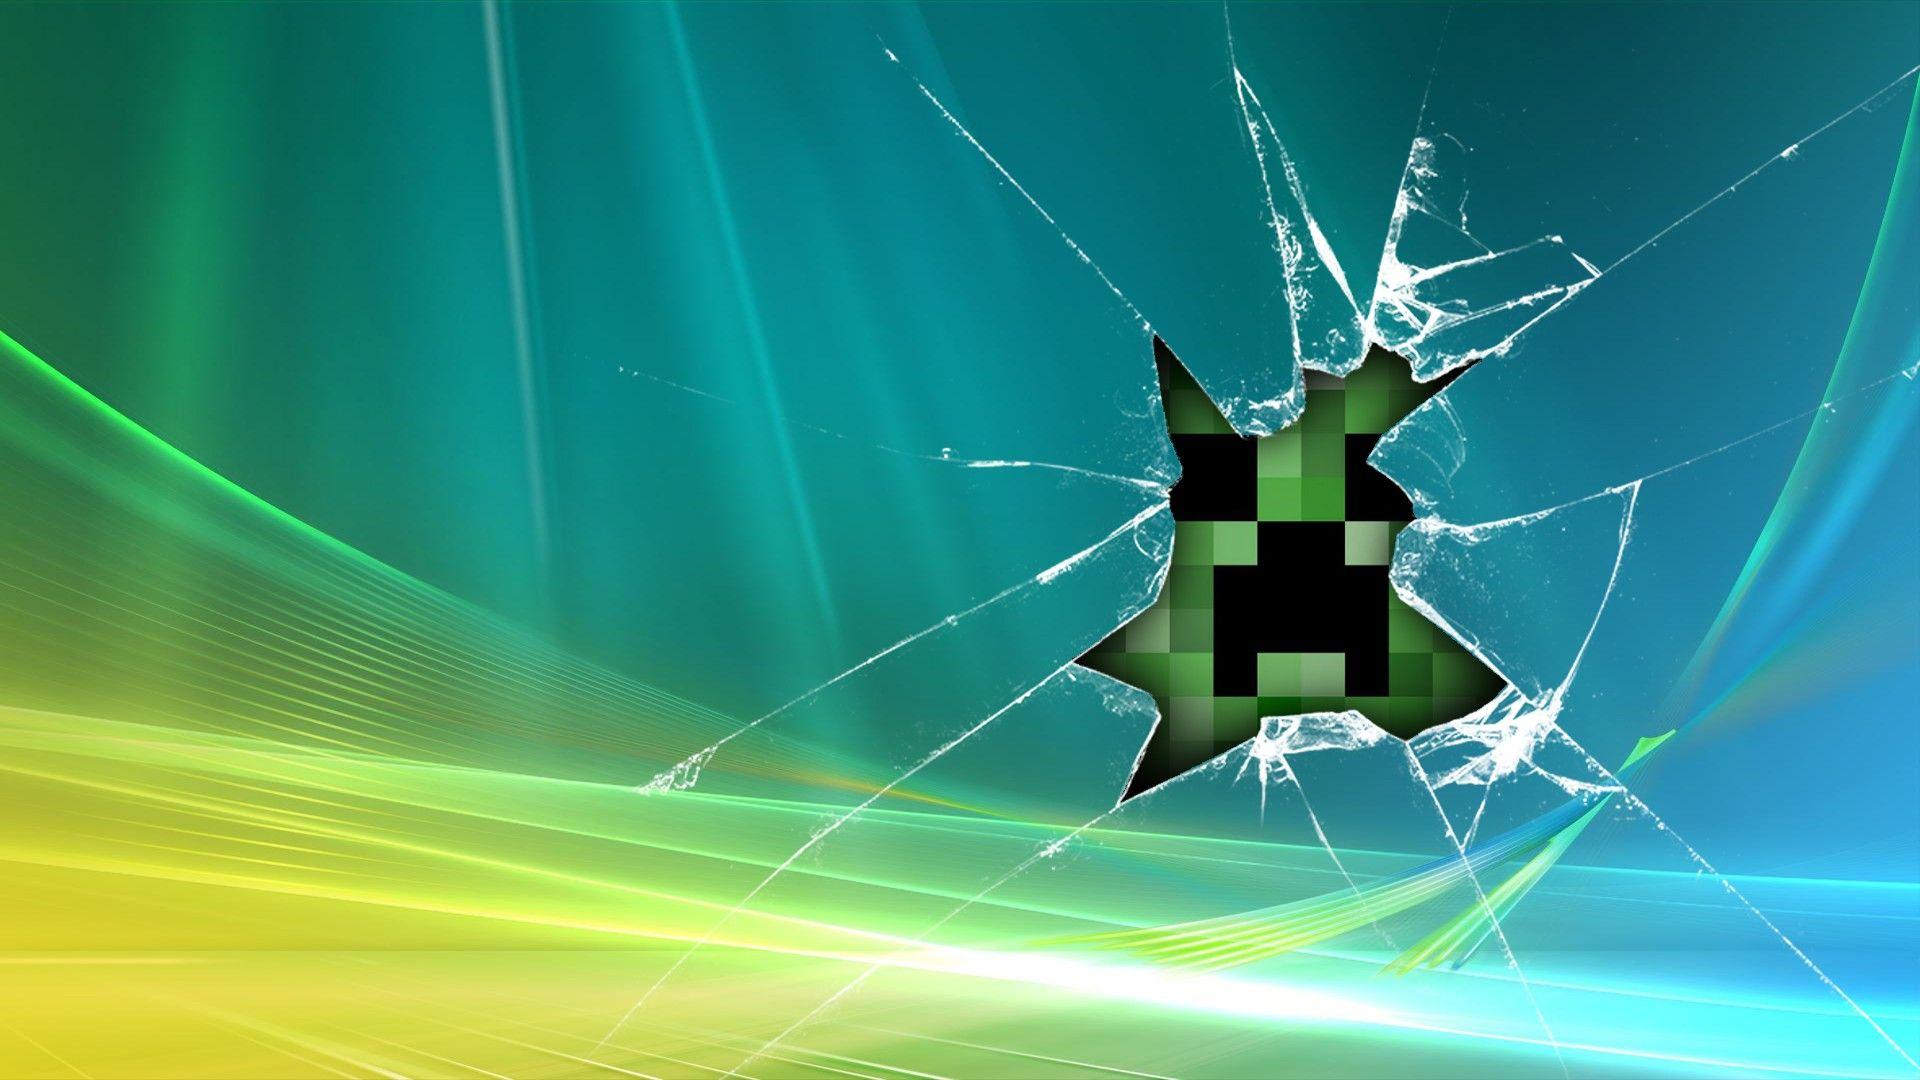 Minecarft Creeper For Windows Minecraft Wallpaper Broken Screen Wallpaper Hd Wallpaper